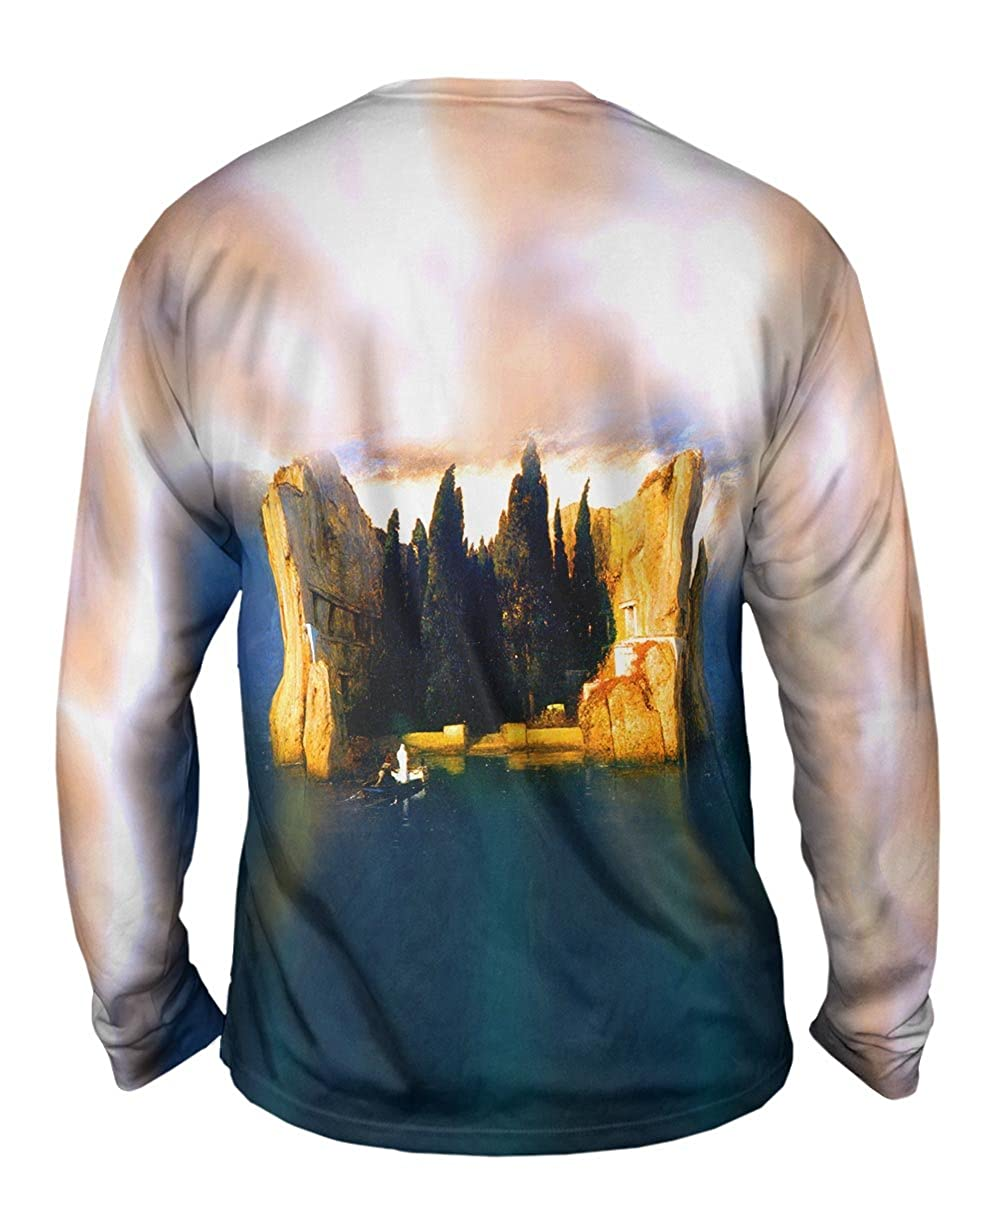 1883 -TShirt- Mens Long Sleeve Yizzam- Arnold Bocklin Island Of The Dead